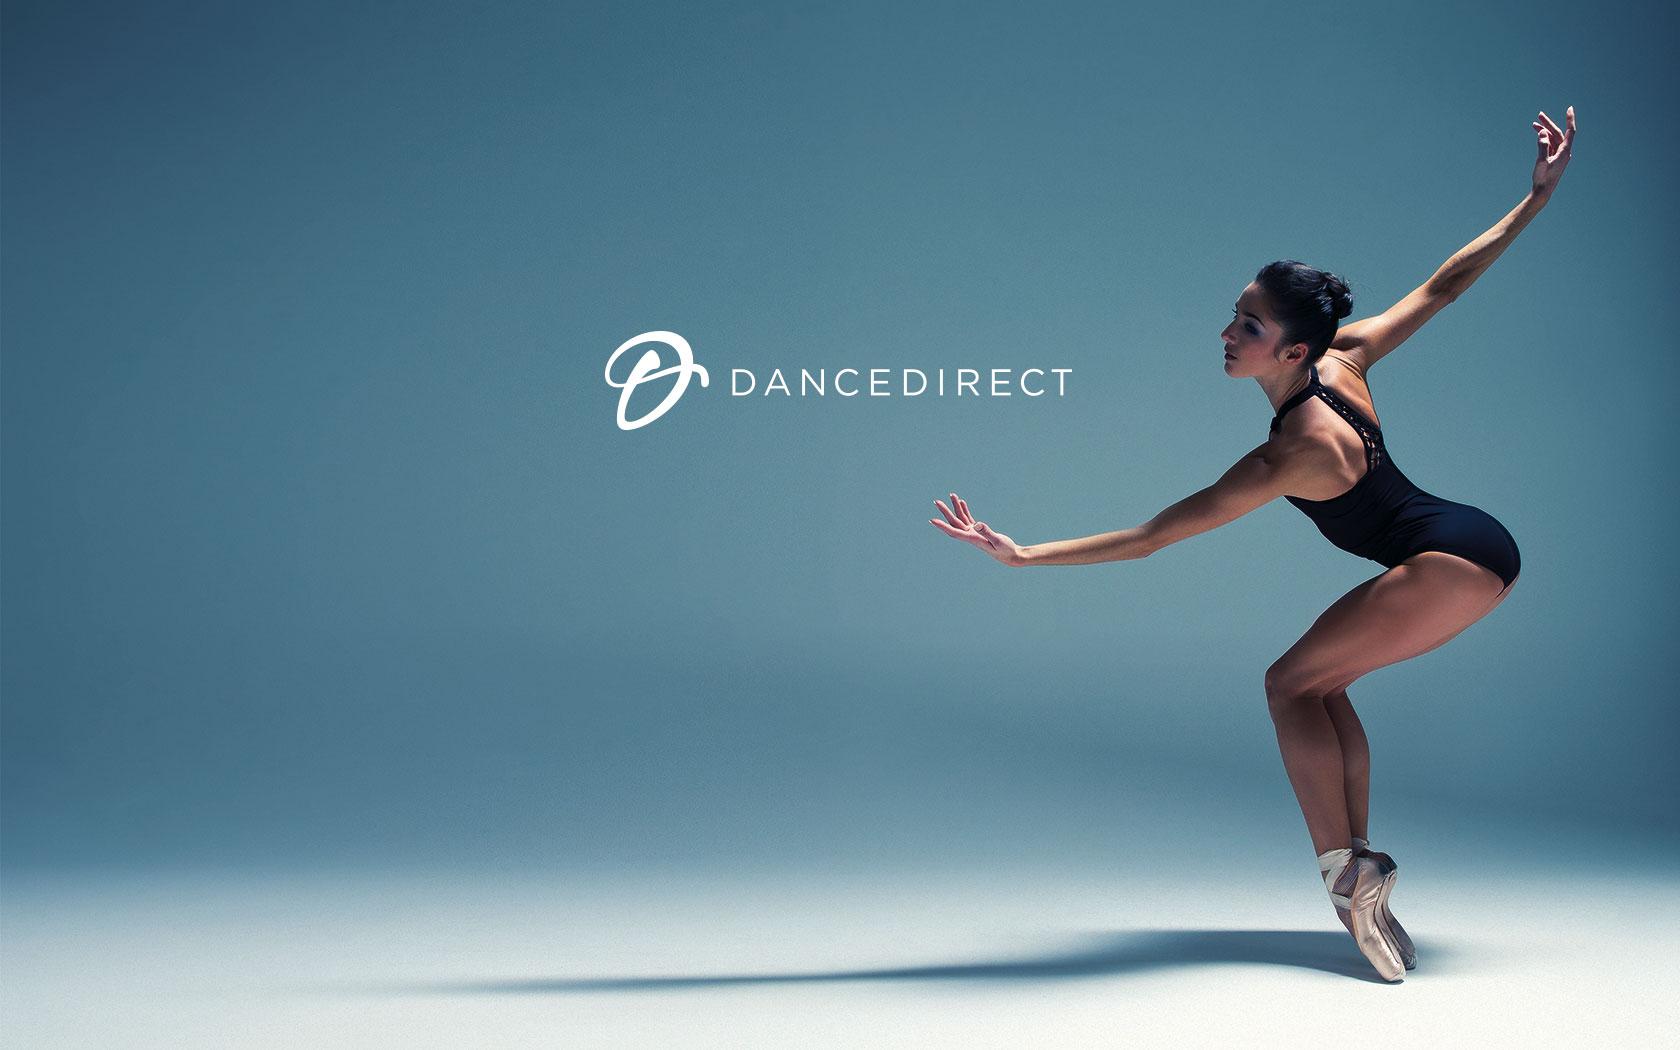 Contemporary Dance Wallpaper Dance direct wallpapers 1680x1050